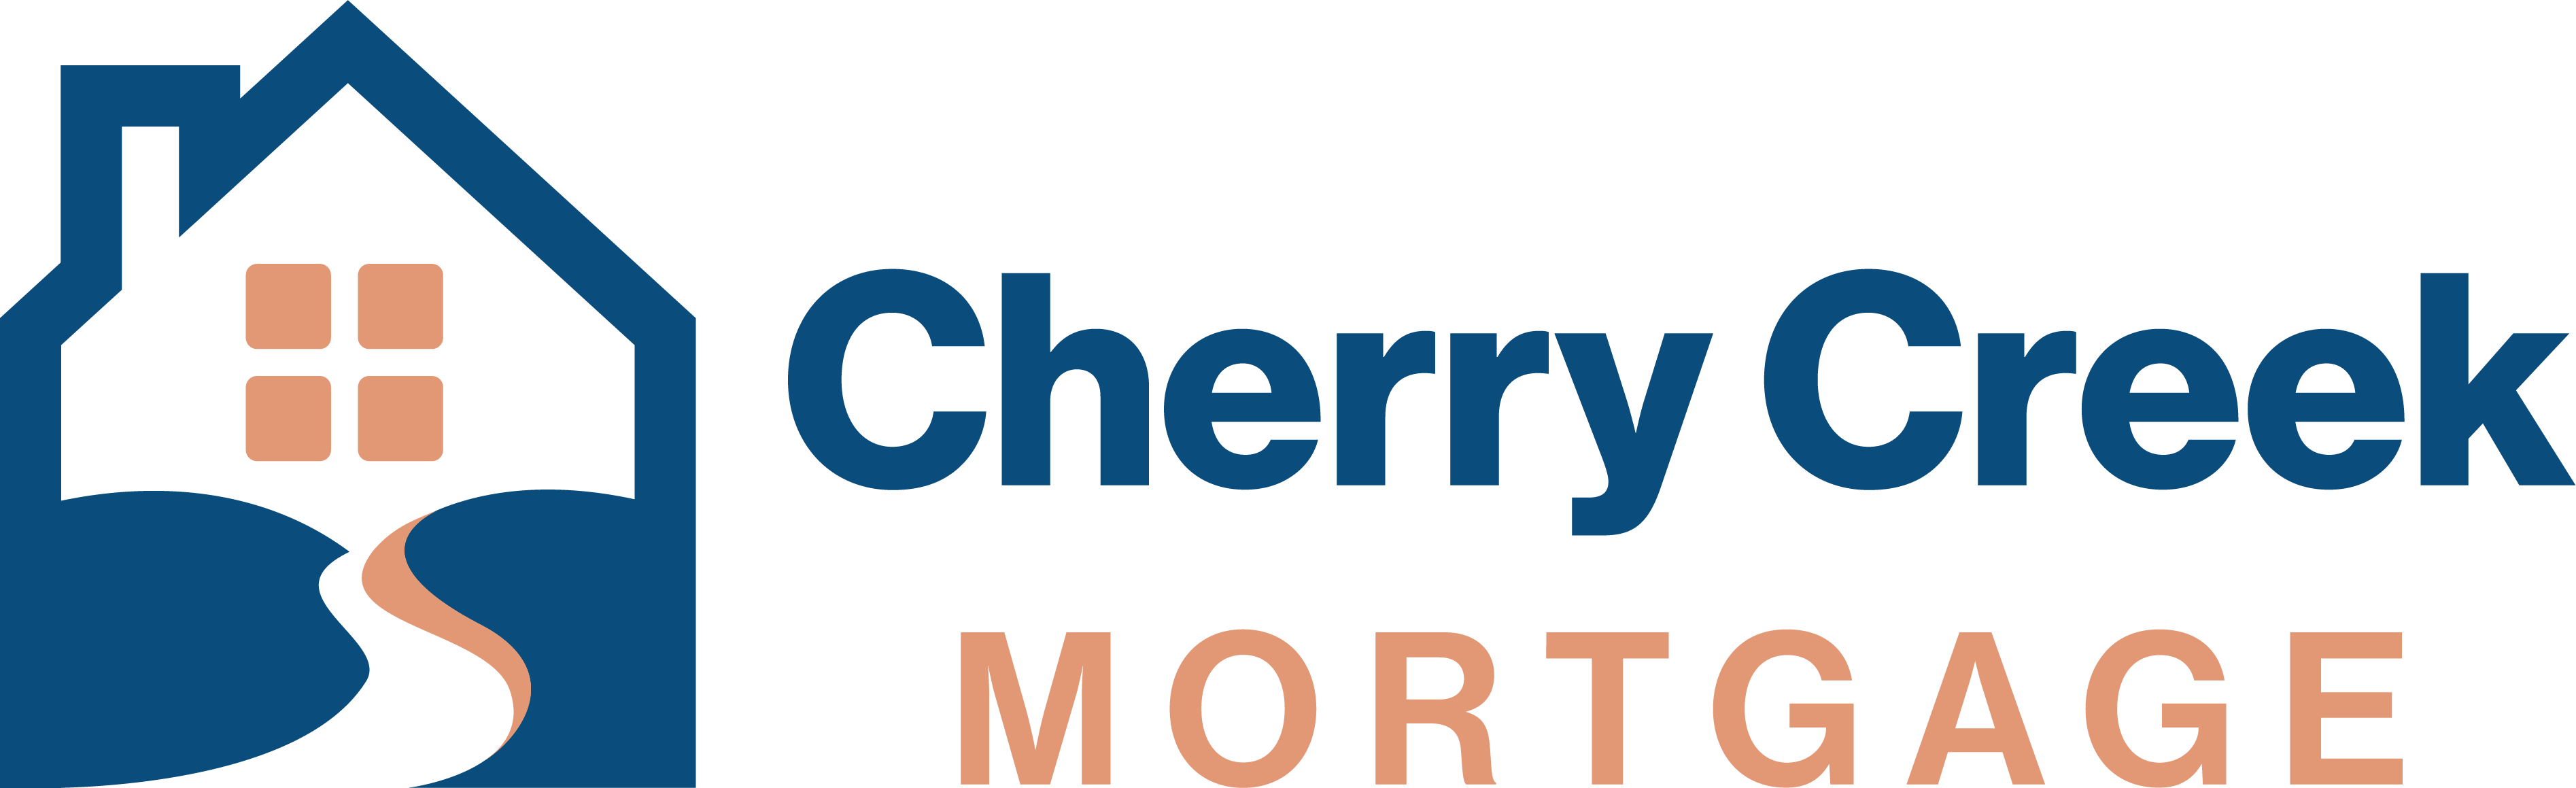 CherryCreekMortgage